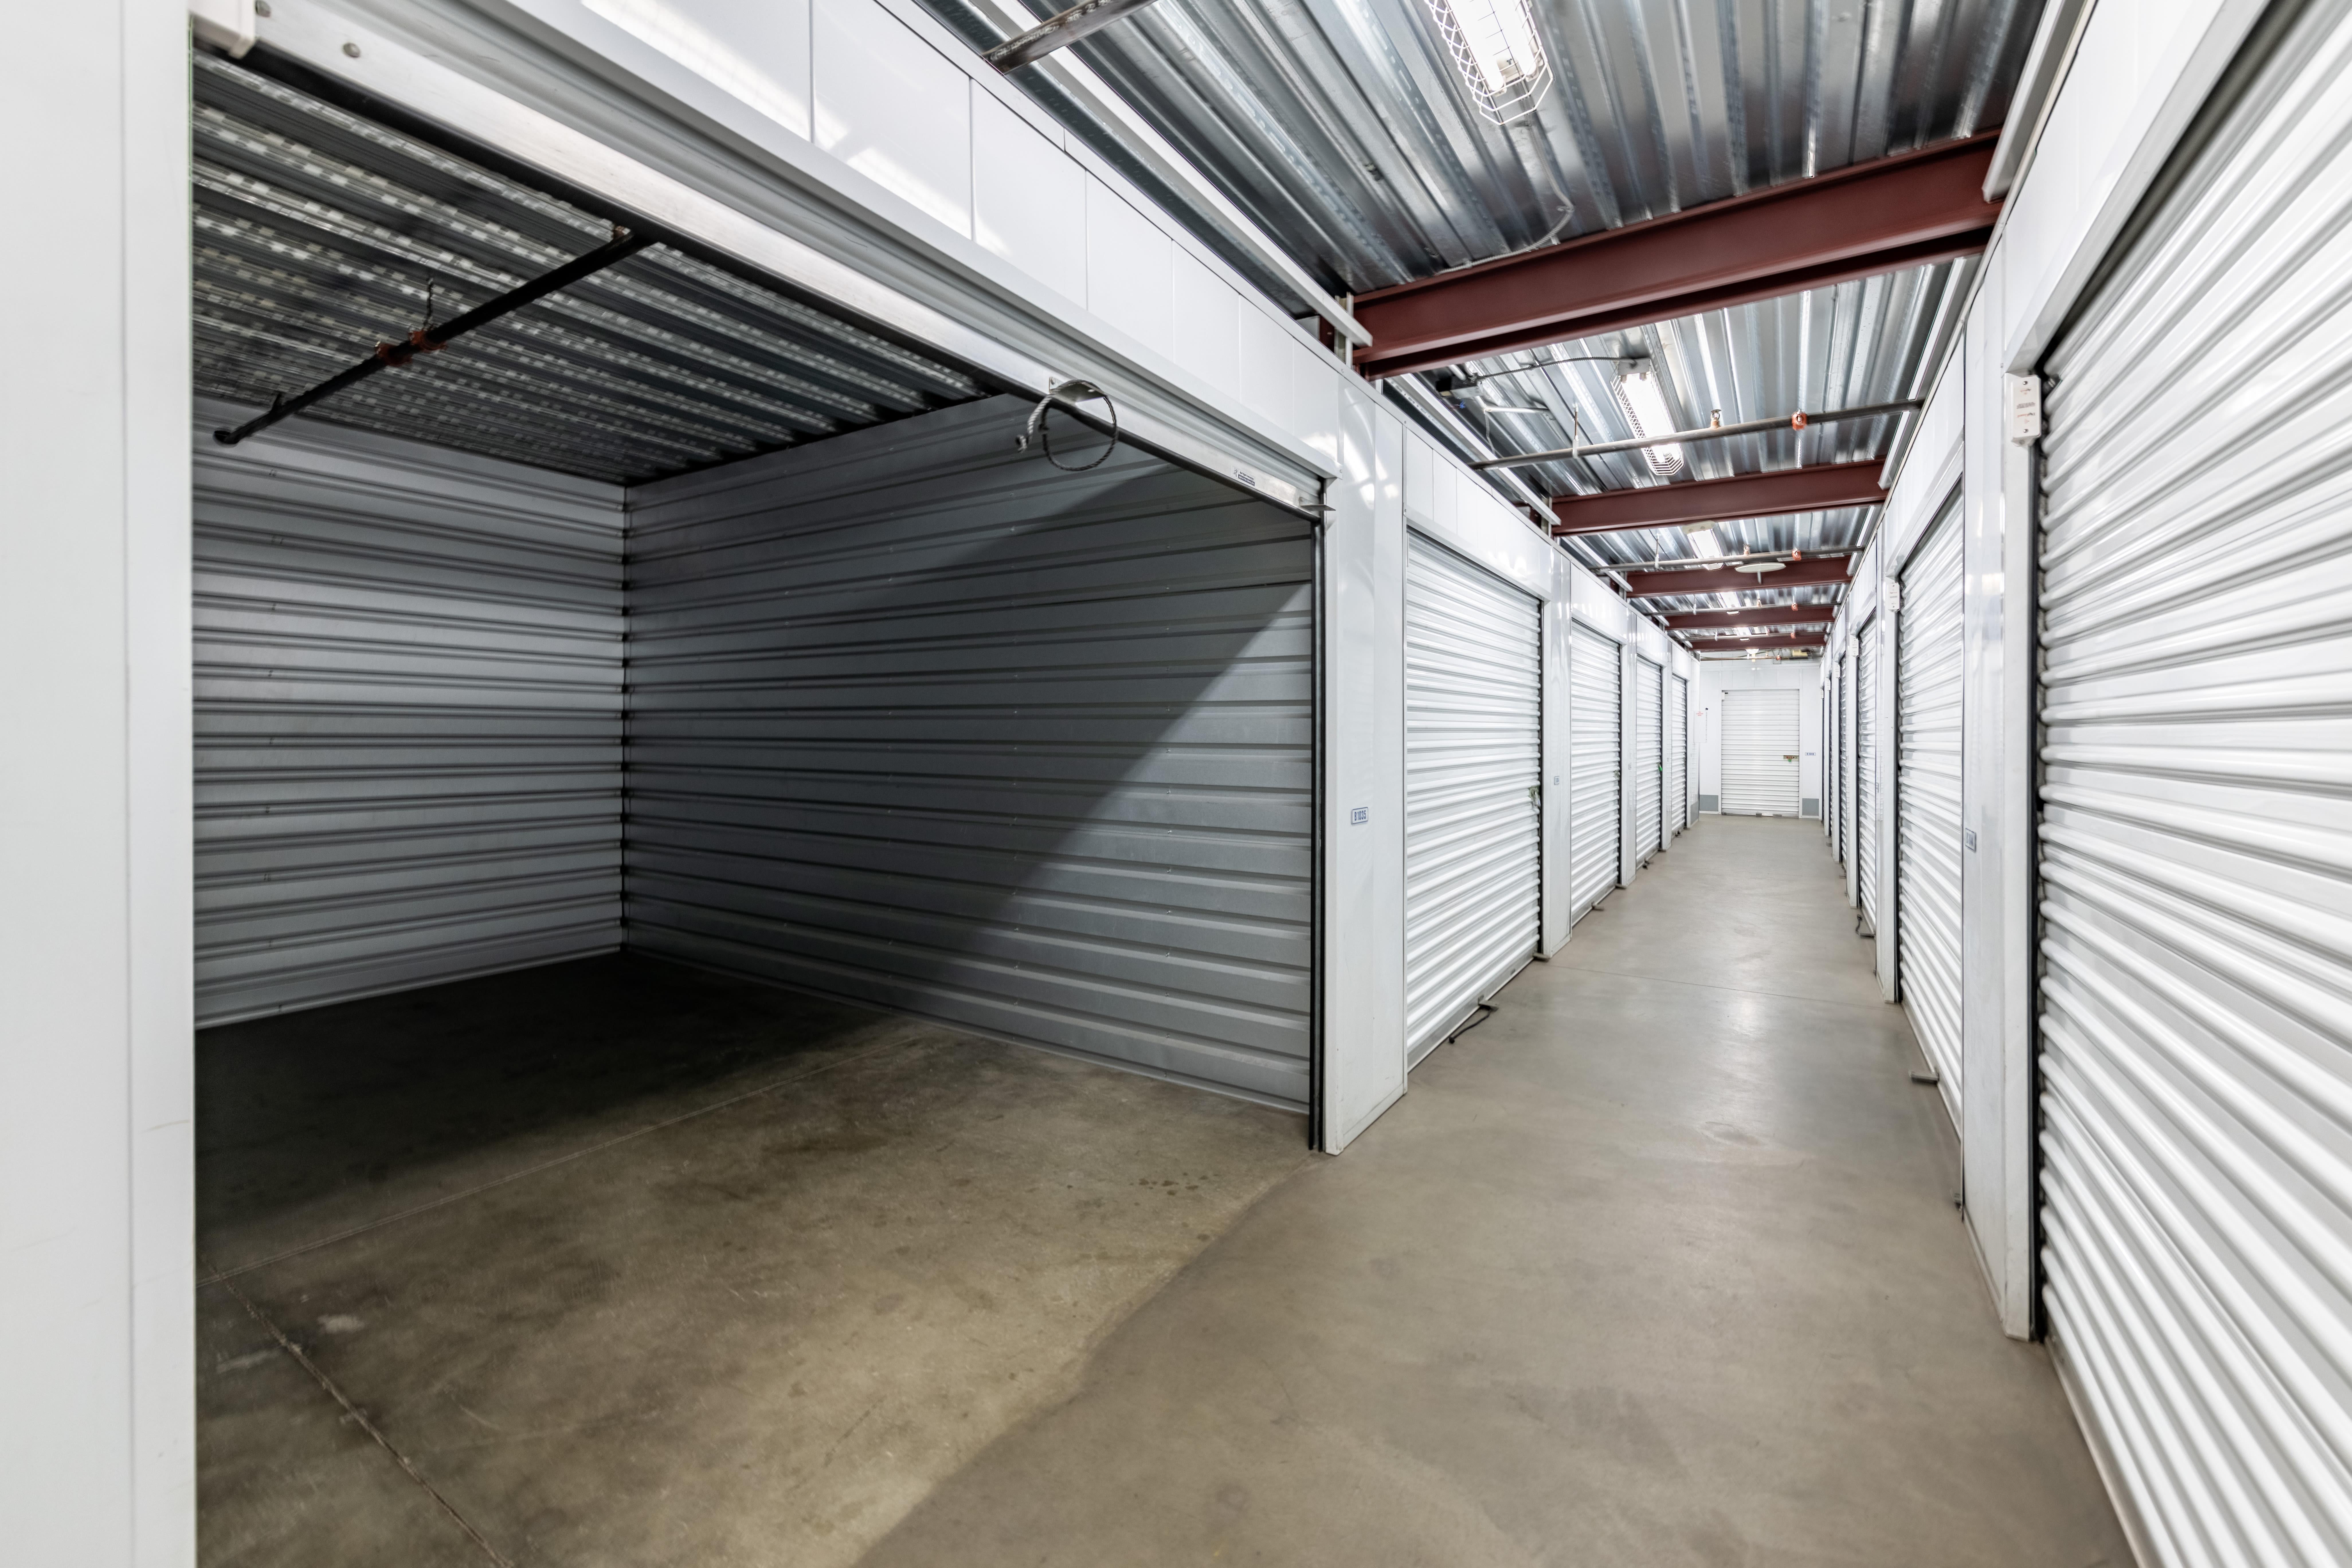 Open Indoor Storage Unit at at Storage Etc... Long Beach